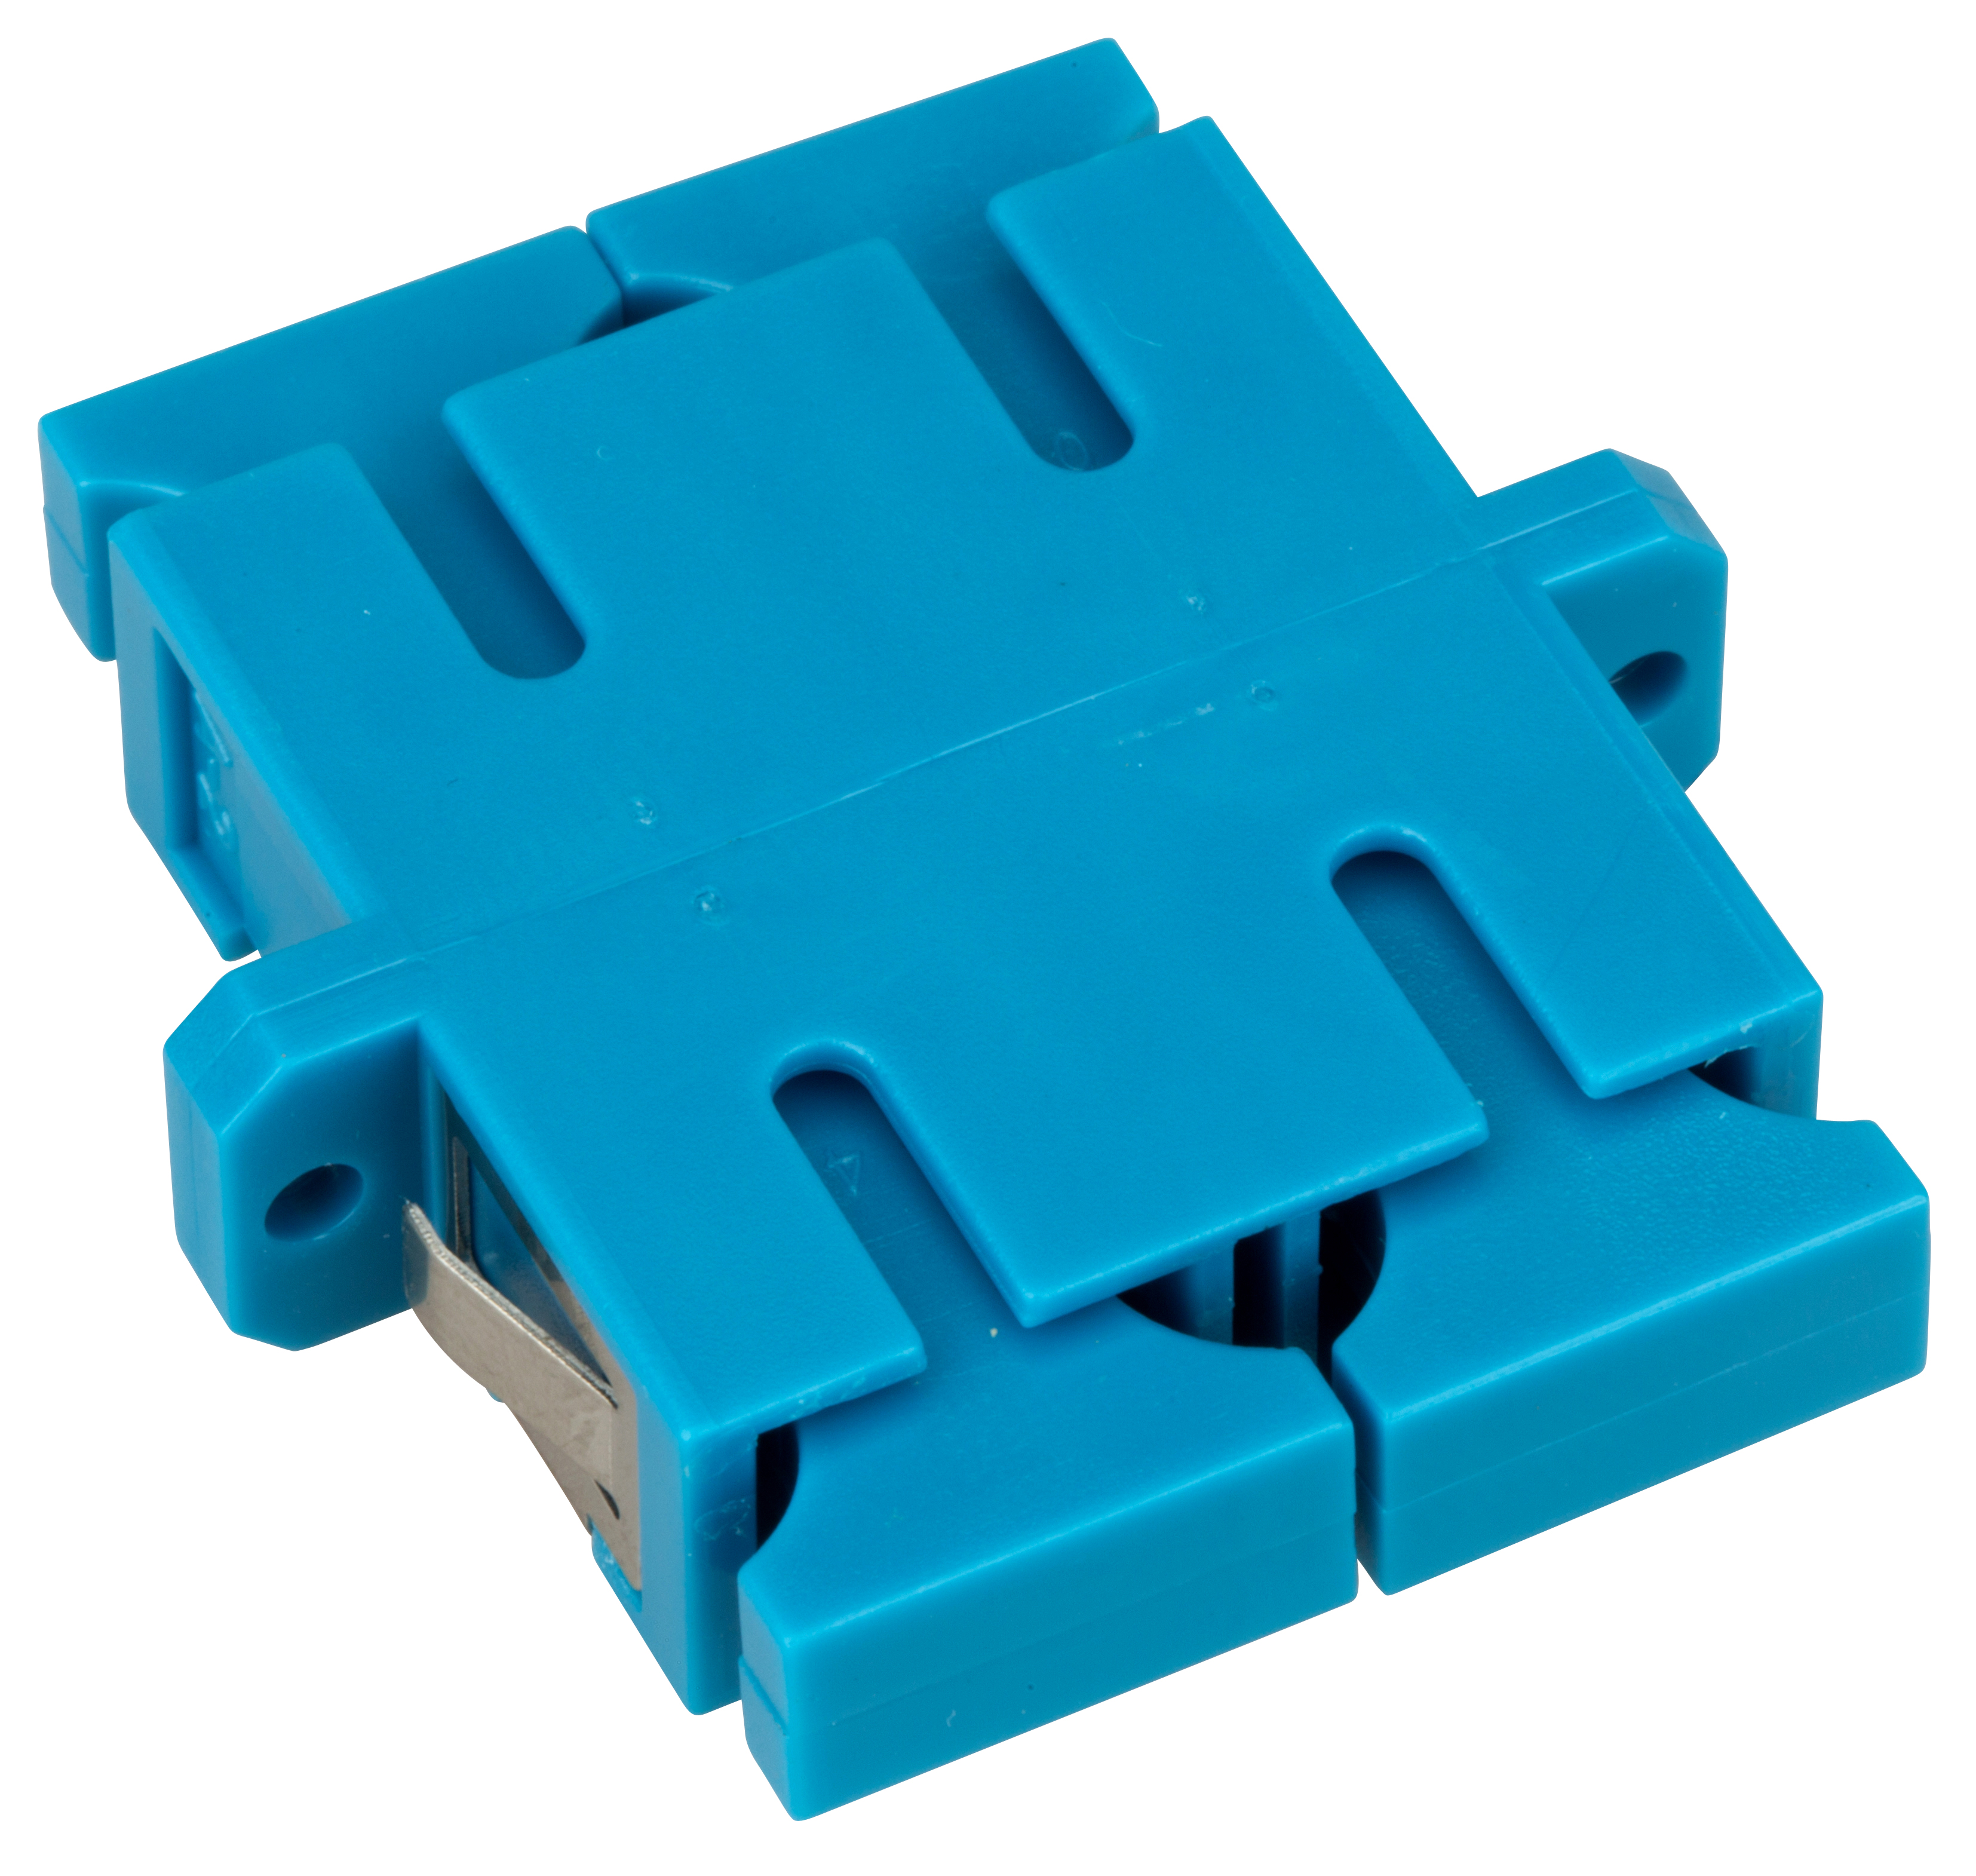 1 Stk LWL Kupplung SC-Duplex, Singlemode, zirc, Flansch, blau, ECO HMOLE00054